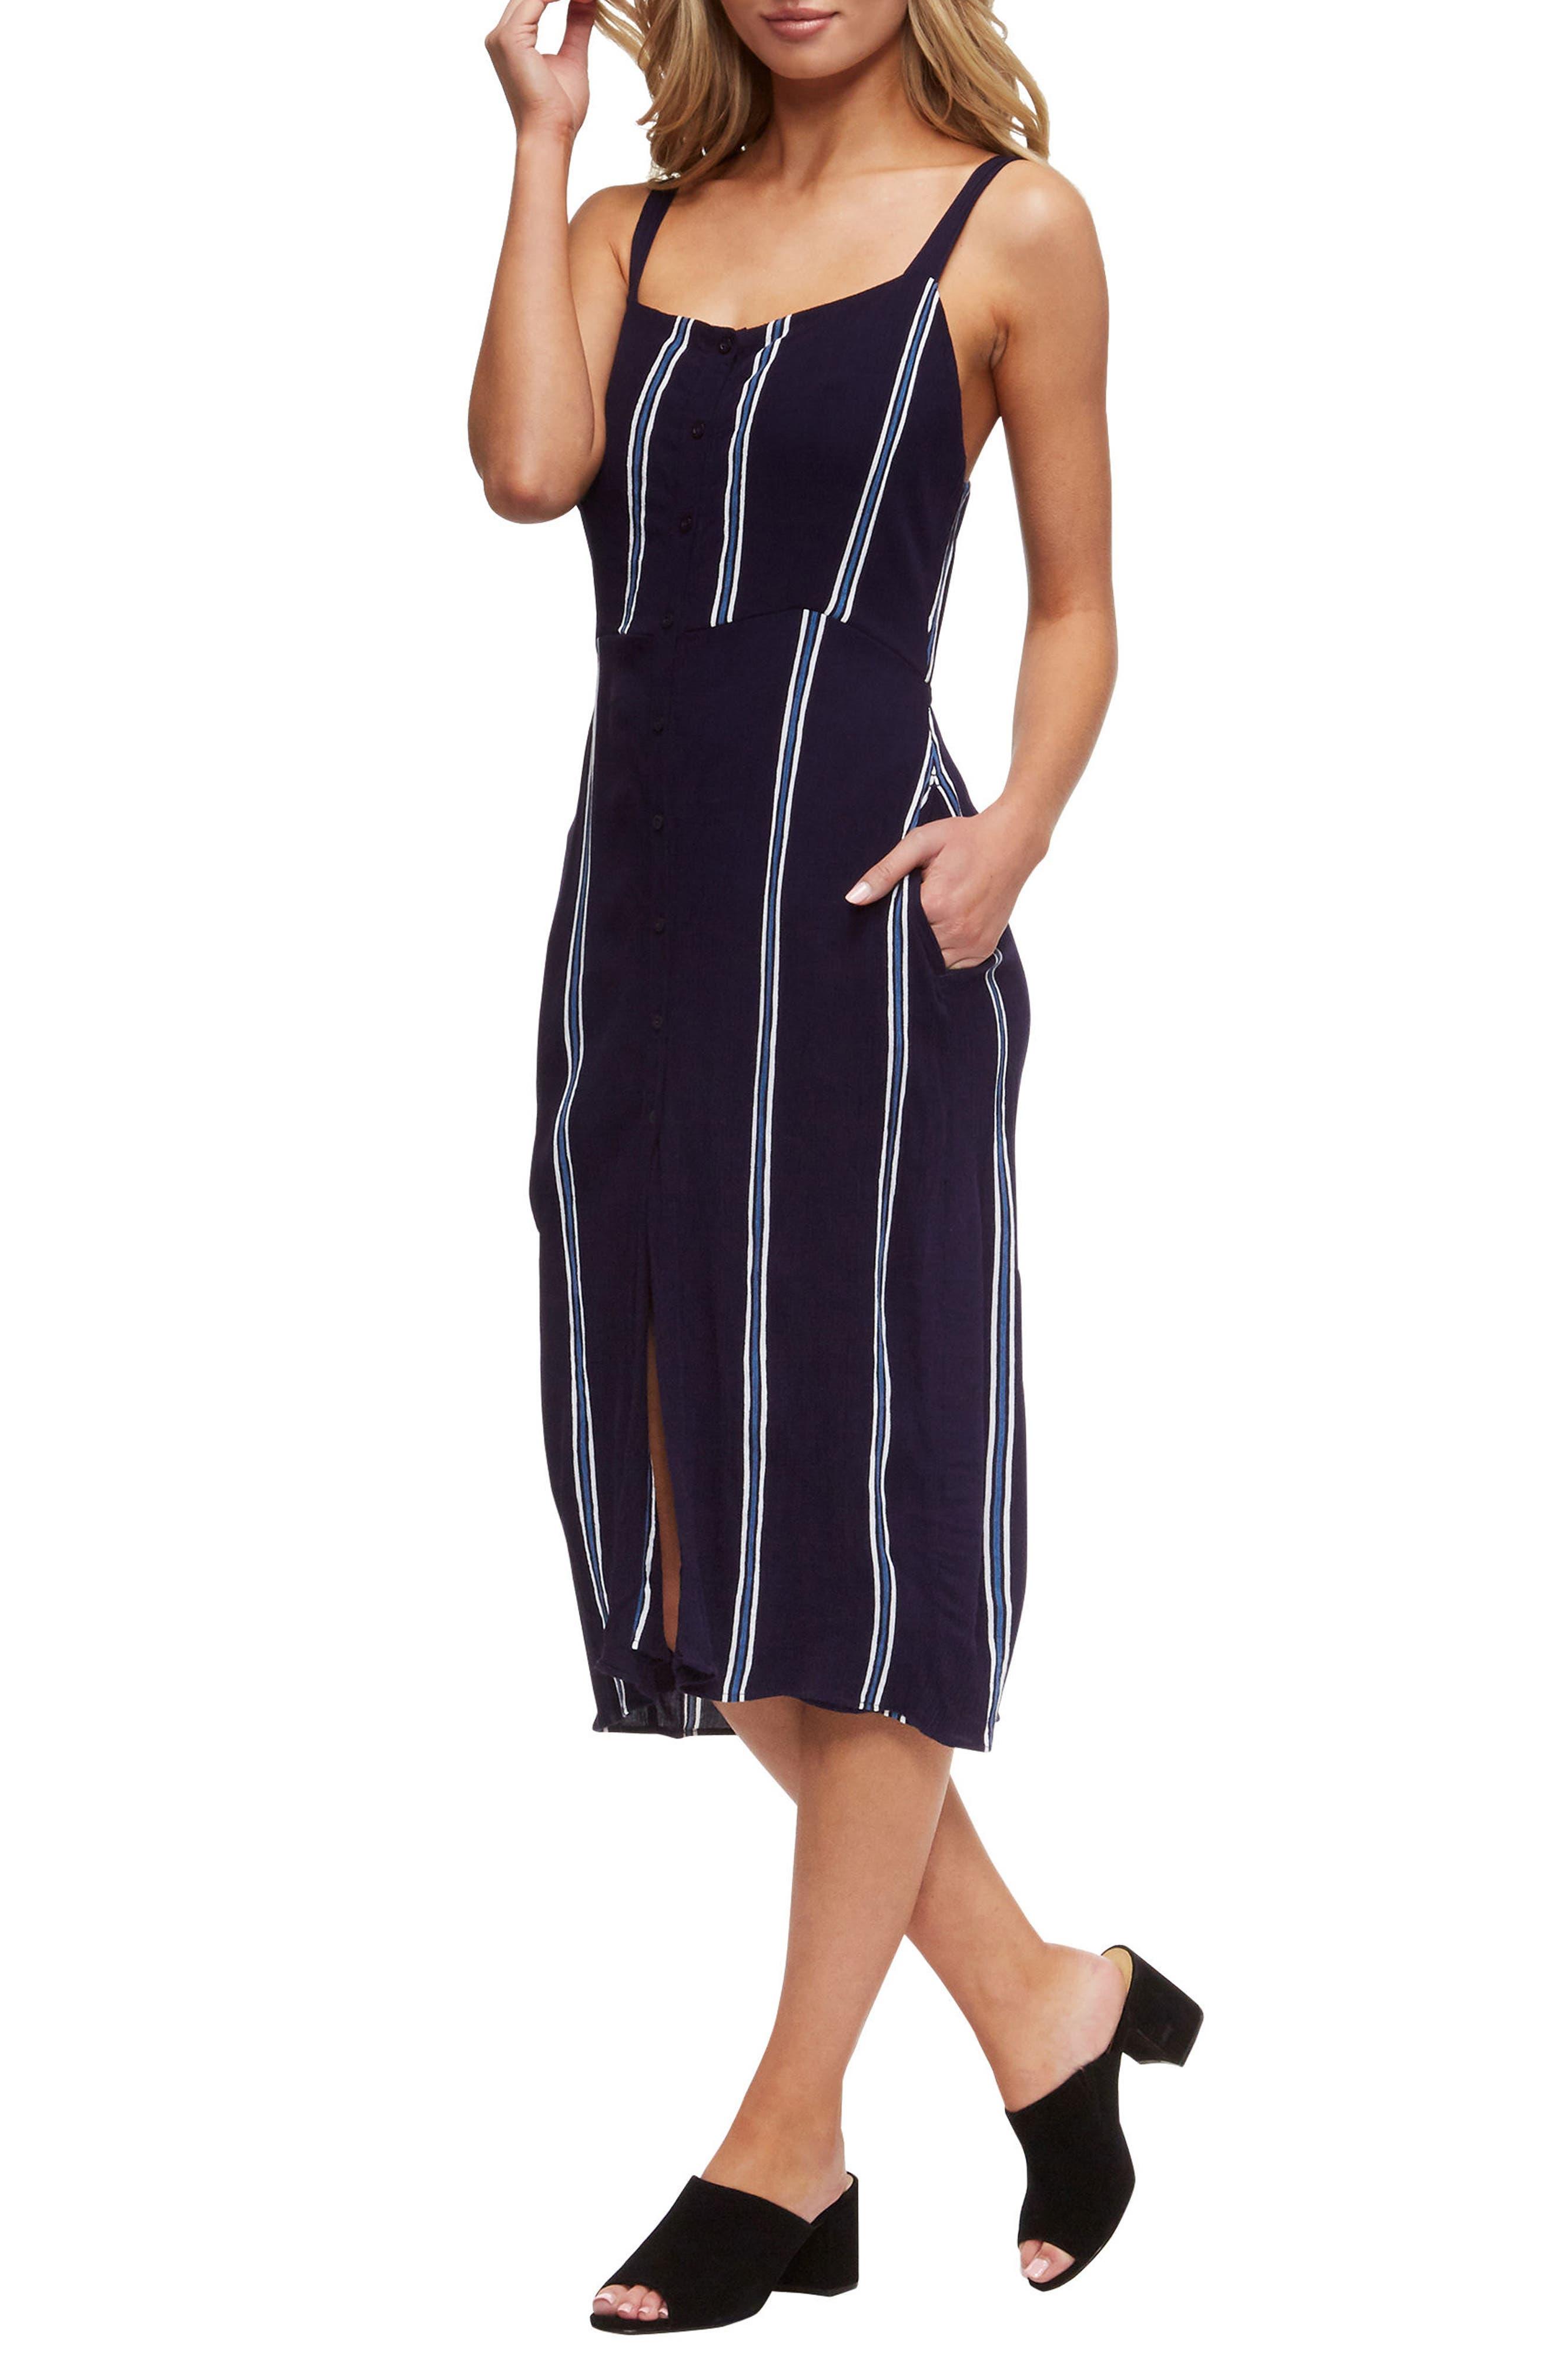 Geni Cover-Up Dress,                             Alternate thumbnail 5, color,                             Evening Blue/White Stripe